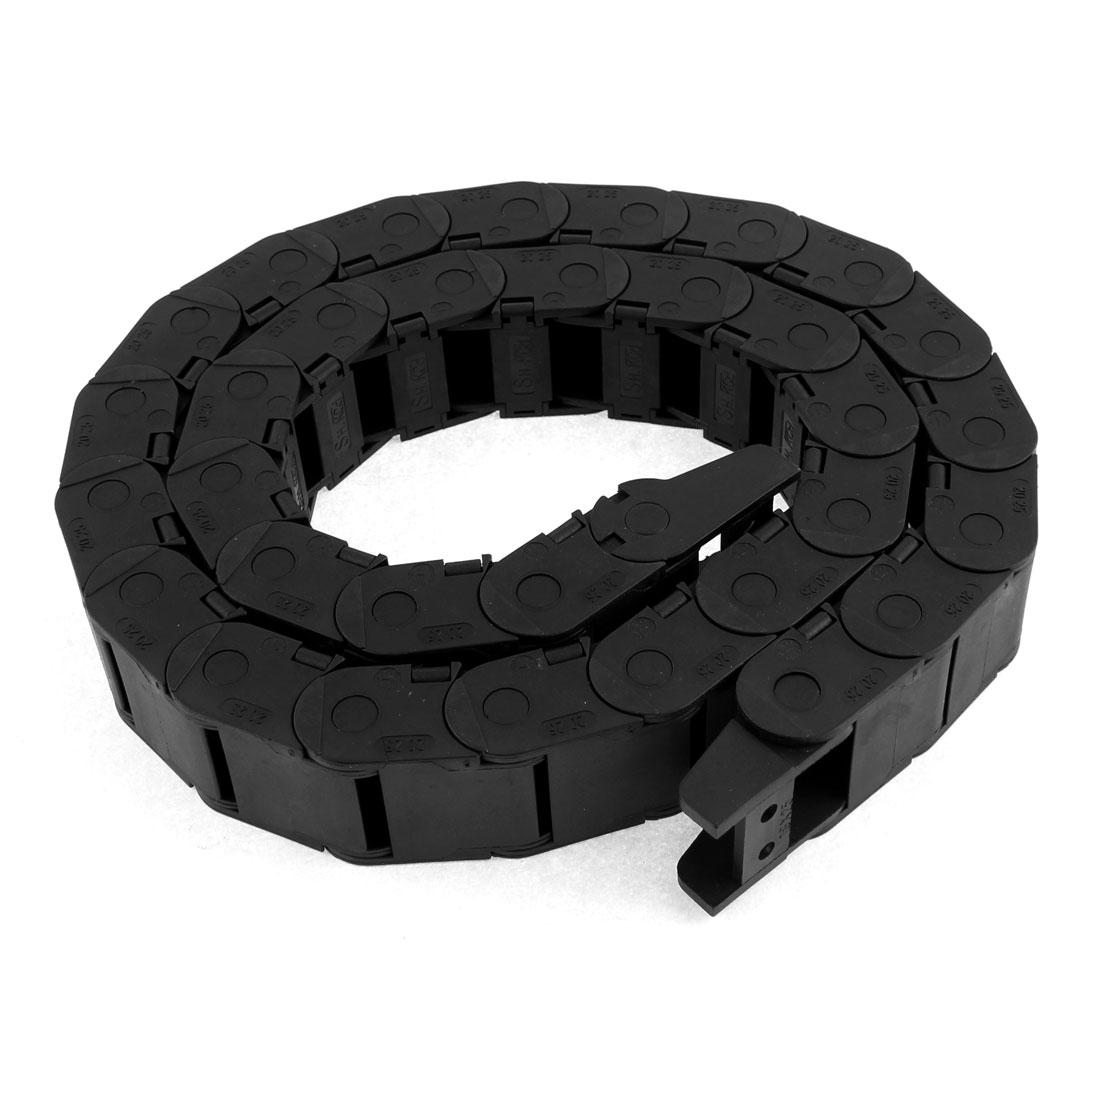 20mm x 25mm Internal Black Plastic Flexible Semi Closed Carrier Cable Drag Chain 108cm 3ft Long